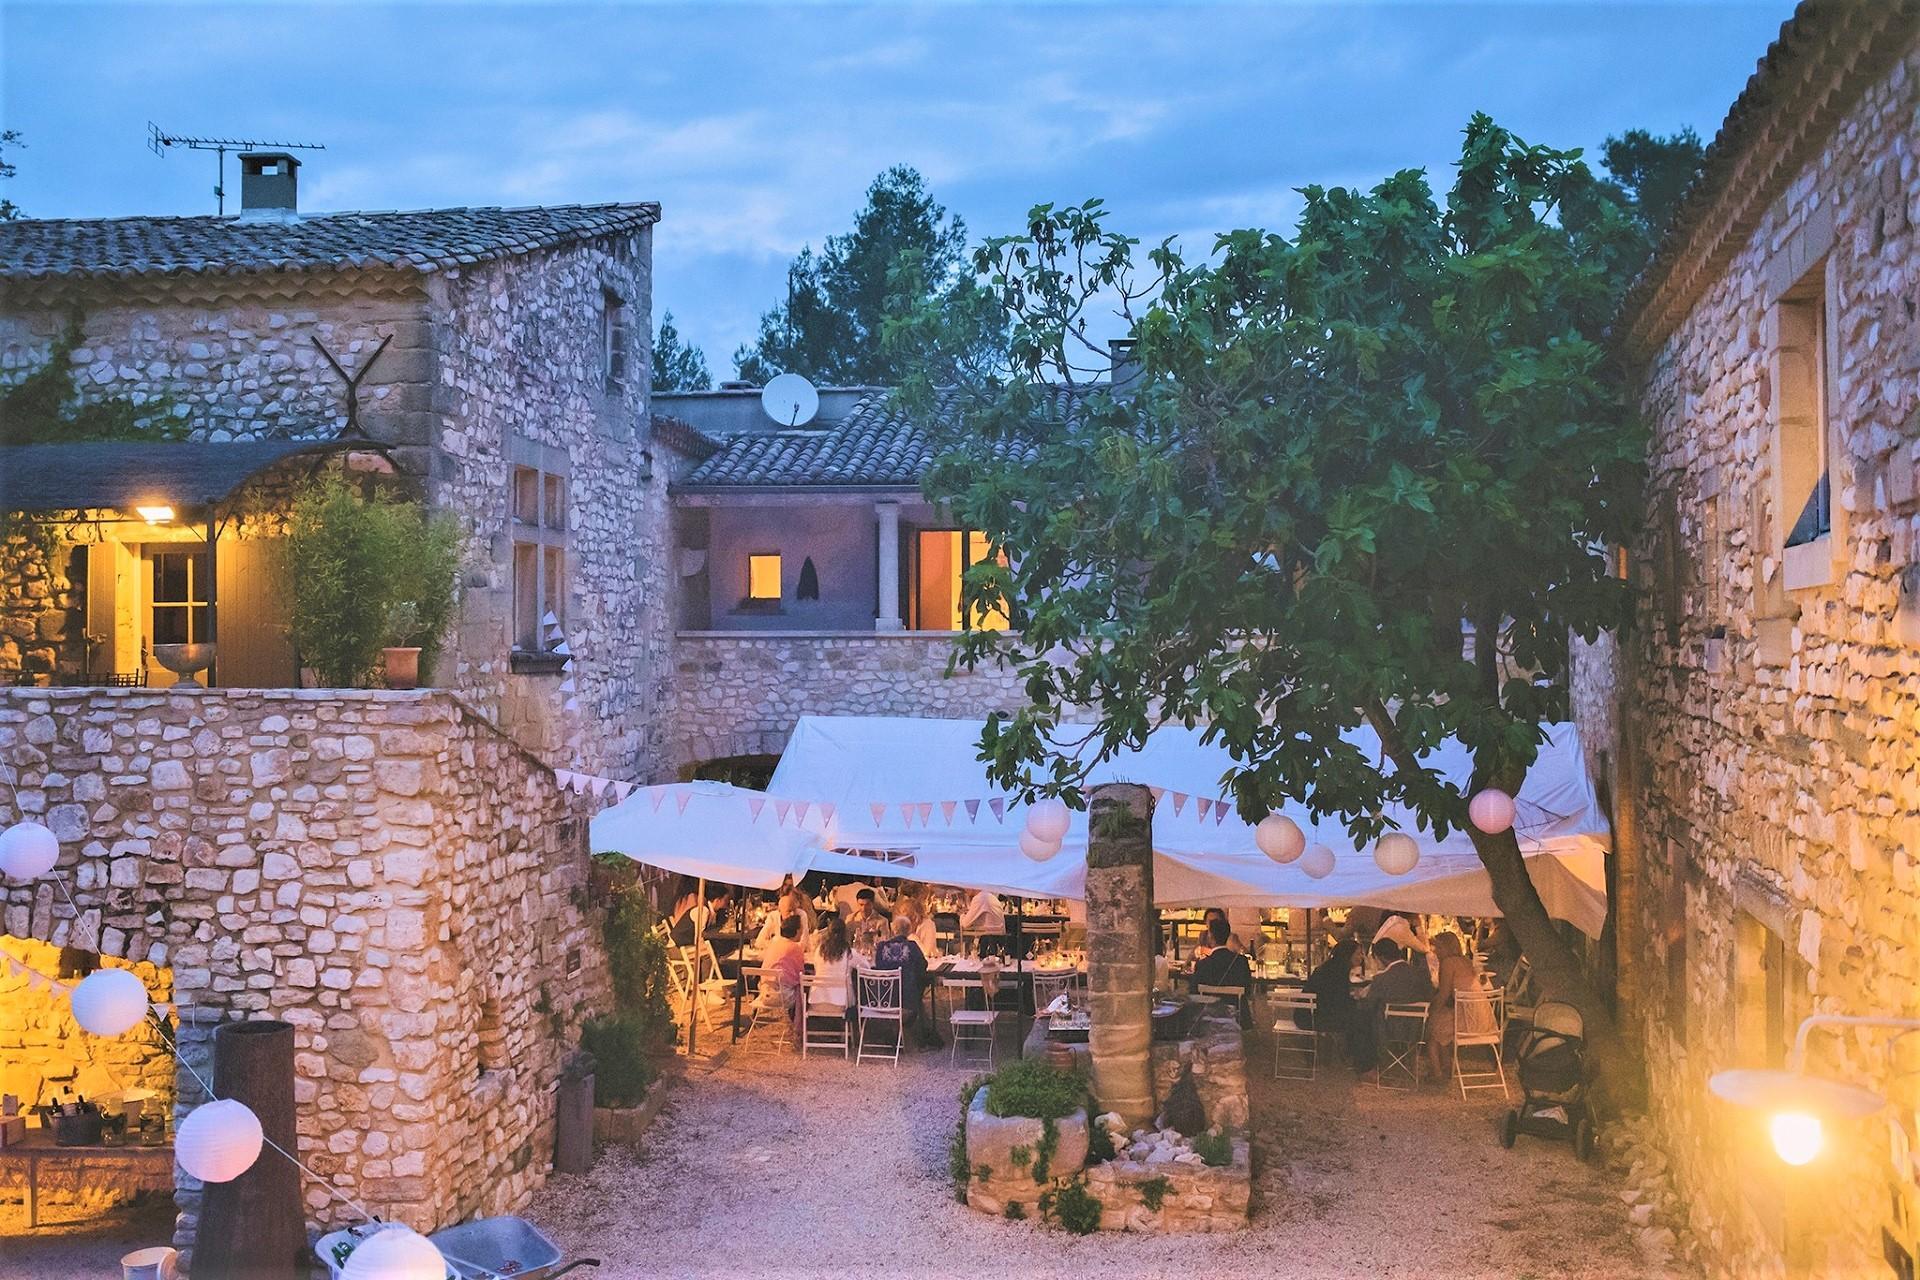 mas-de-rey-uzes-gard-provence-occitanie-diner-seminaires-de-caractere